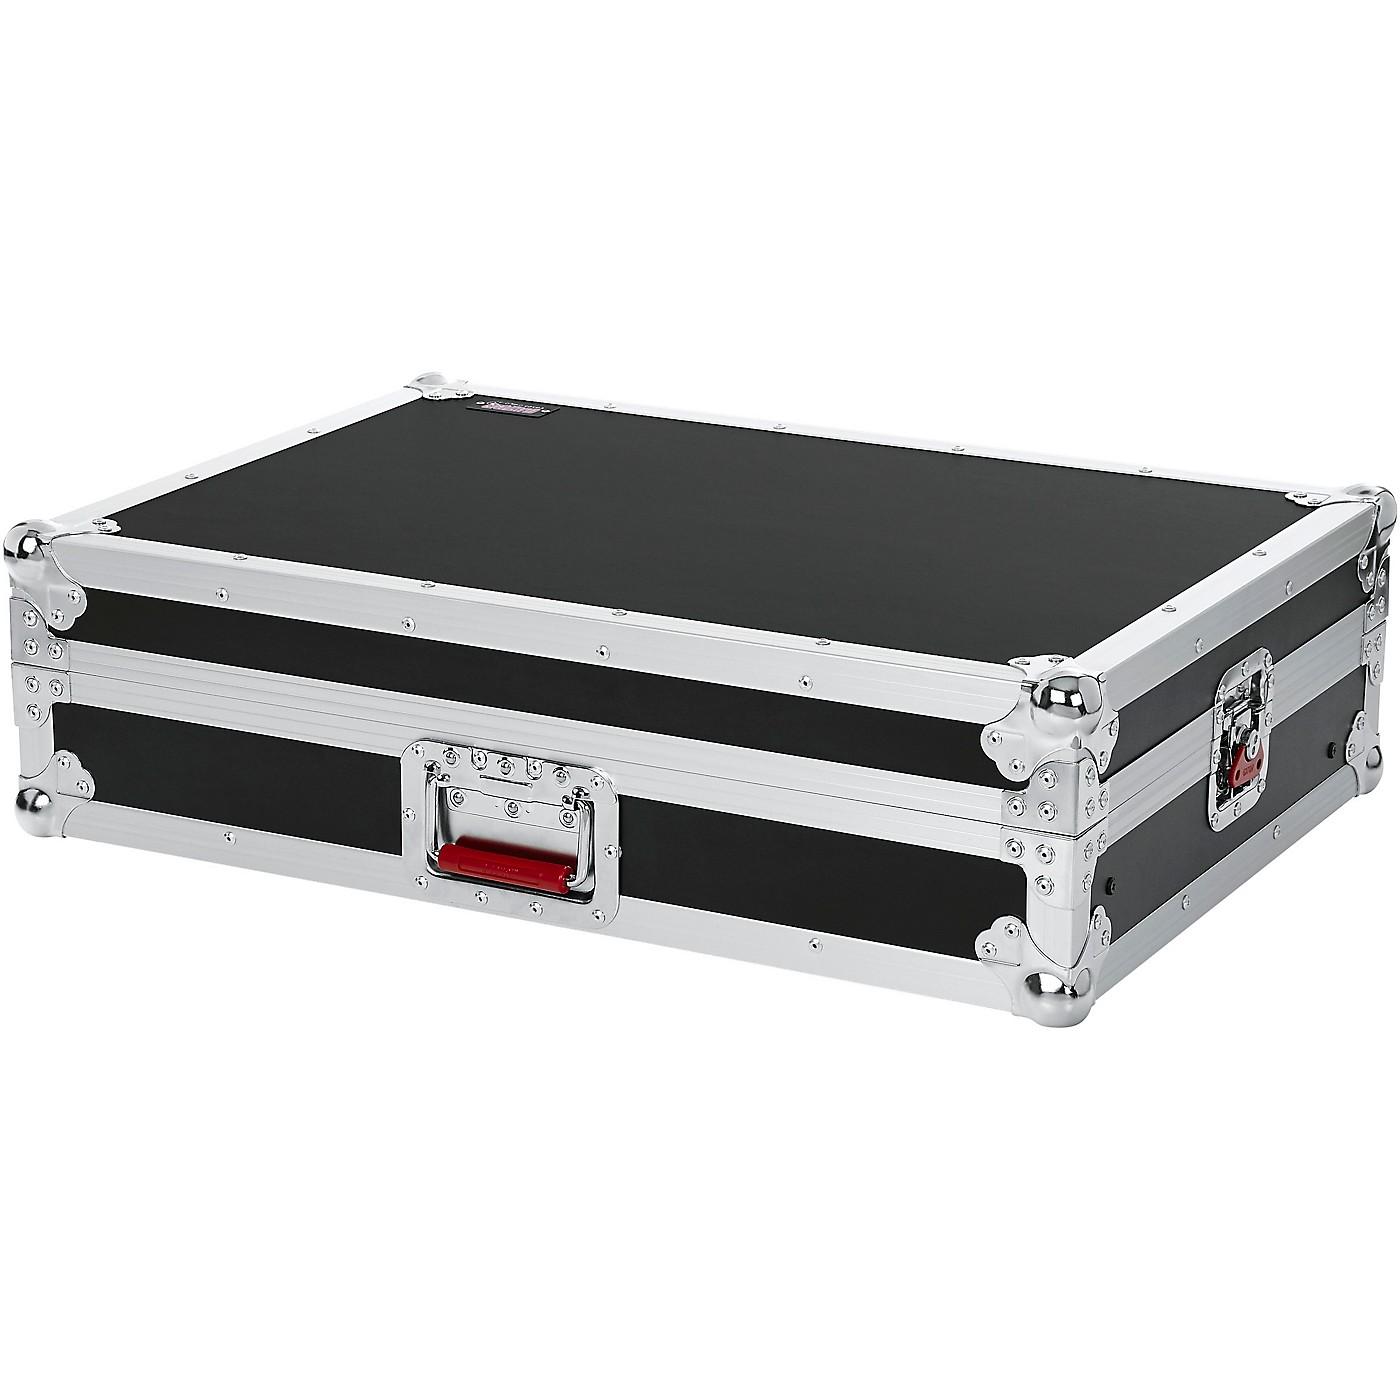 Gator G-TOURDSPDJ808 Road Case for Roland DJ-808 Controller thumbnail